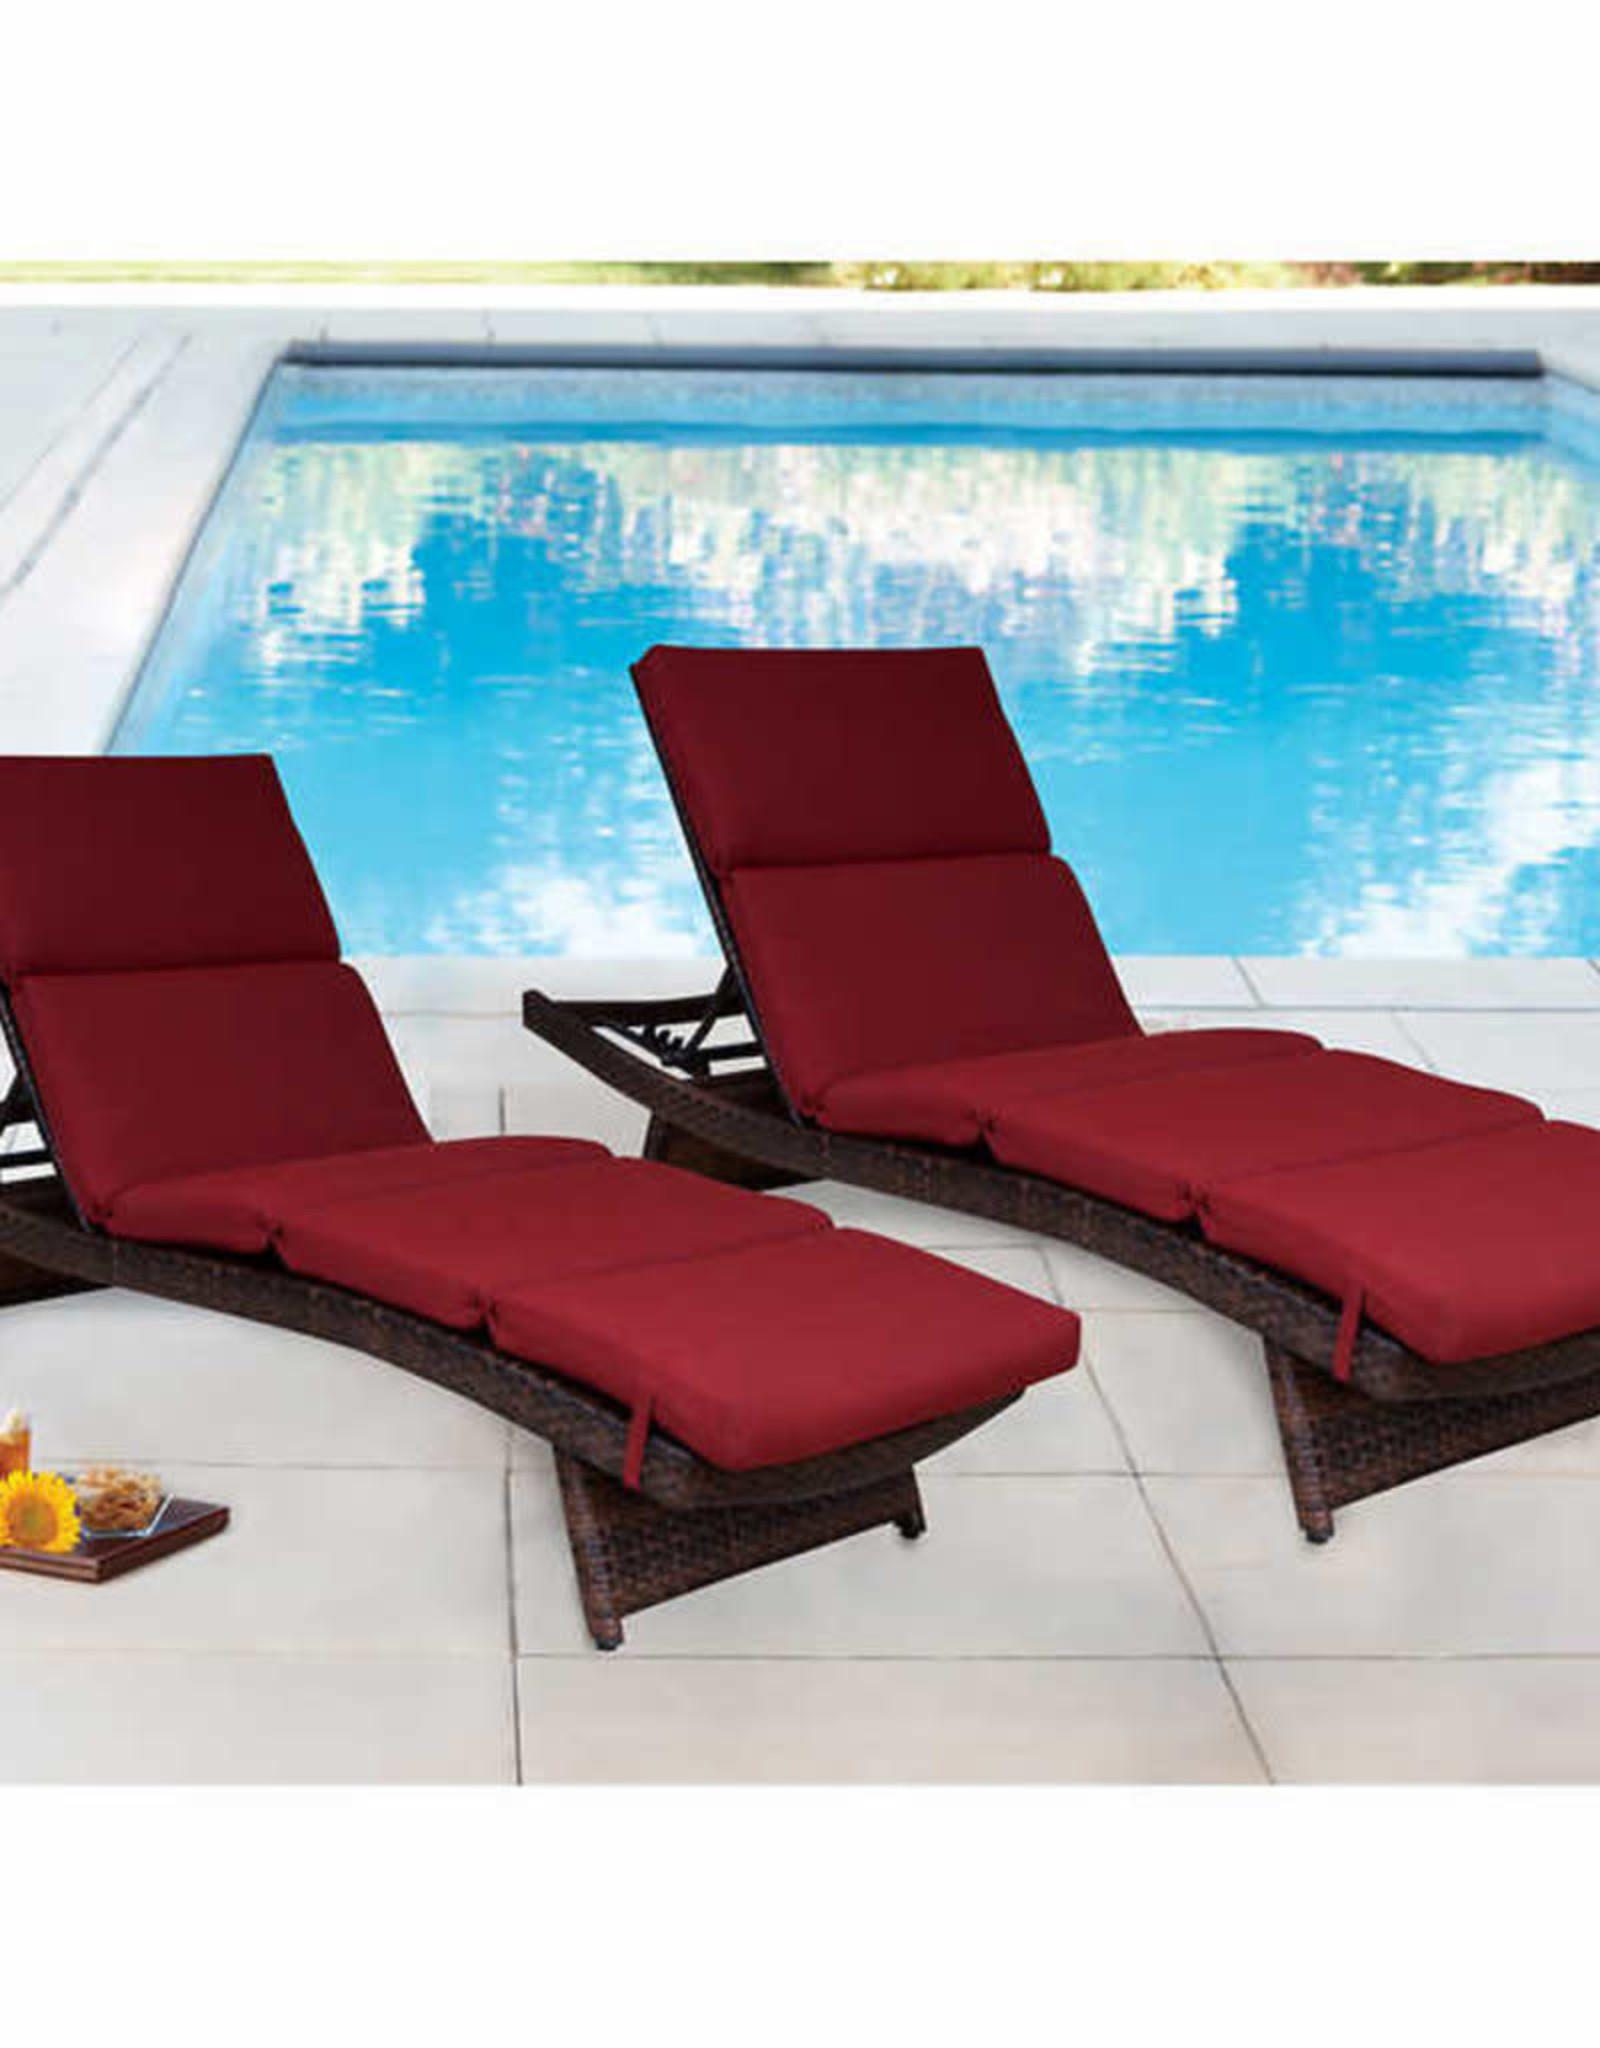 PEAK SEASON INC Chaise Lounge Cushion Ruby